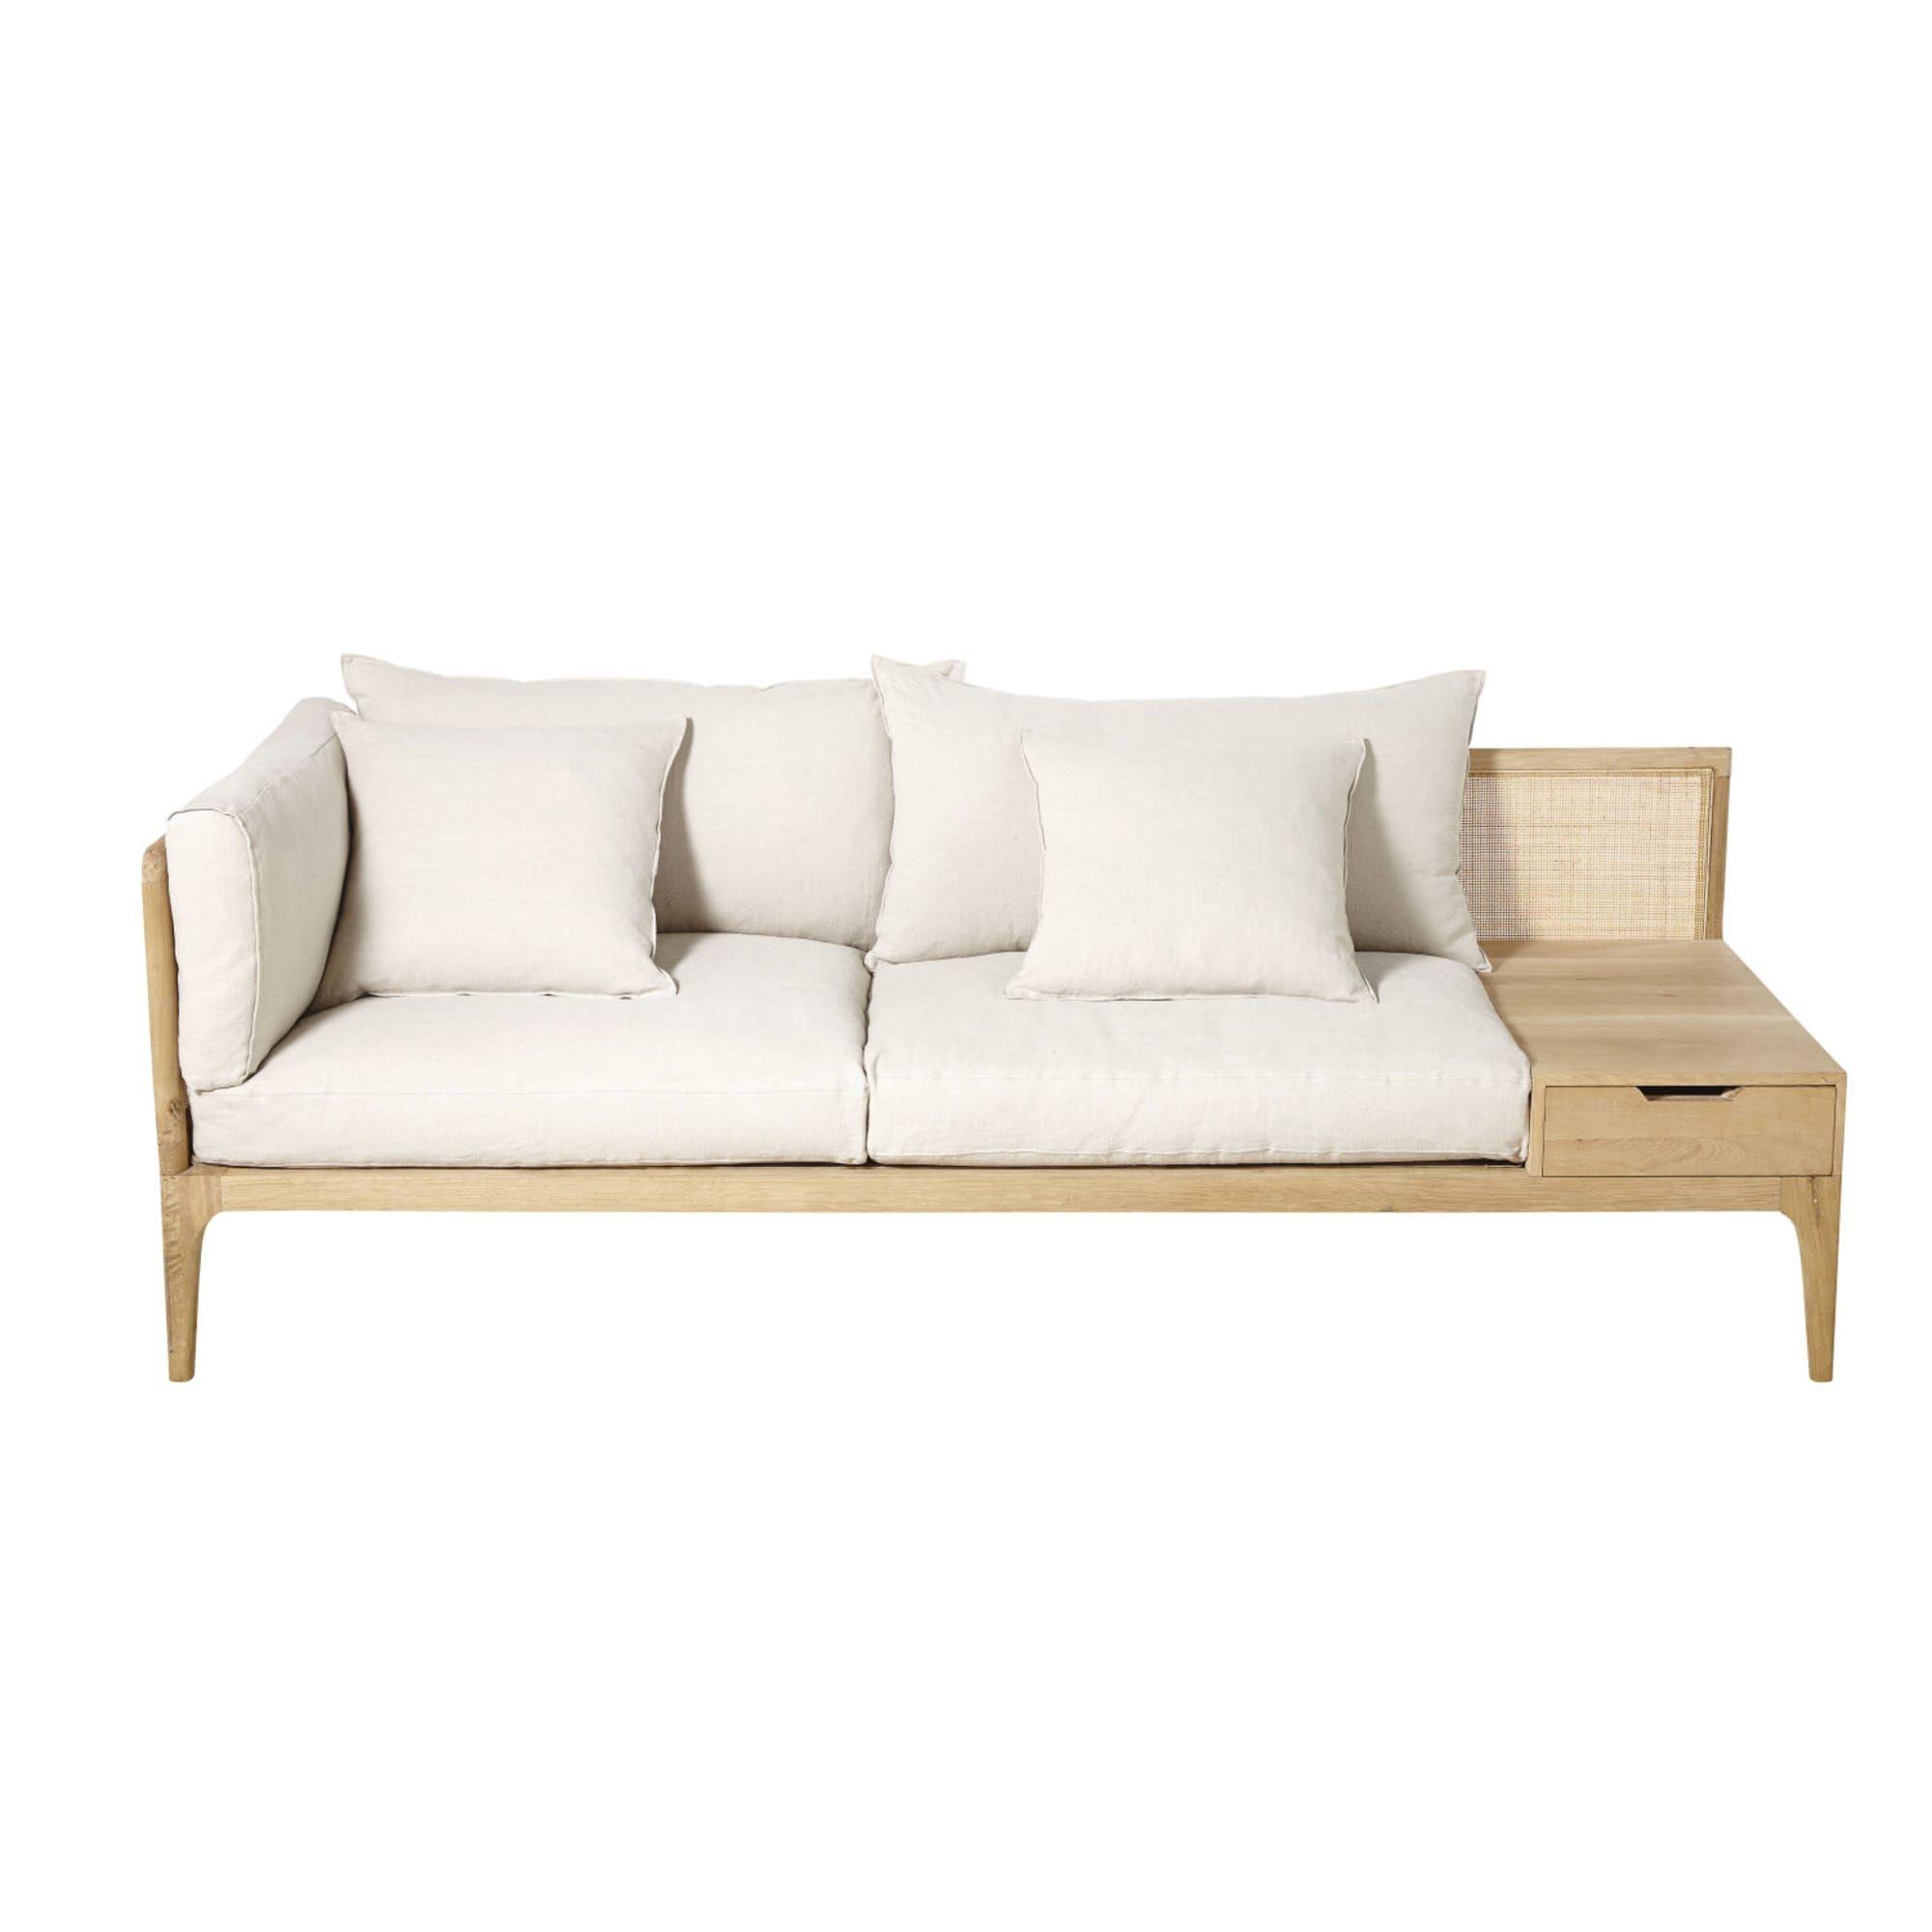 Ivory 3 Seater Linen Sofa Delphes Linen Sofa Sofa Furniture